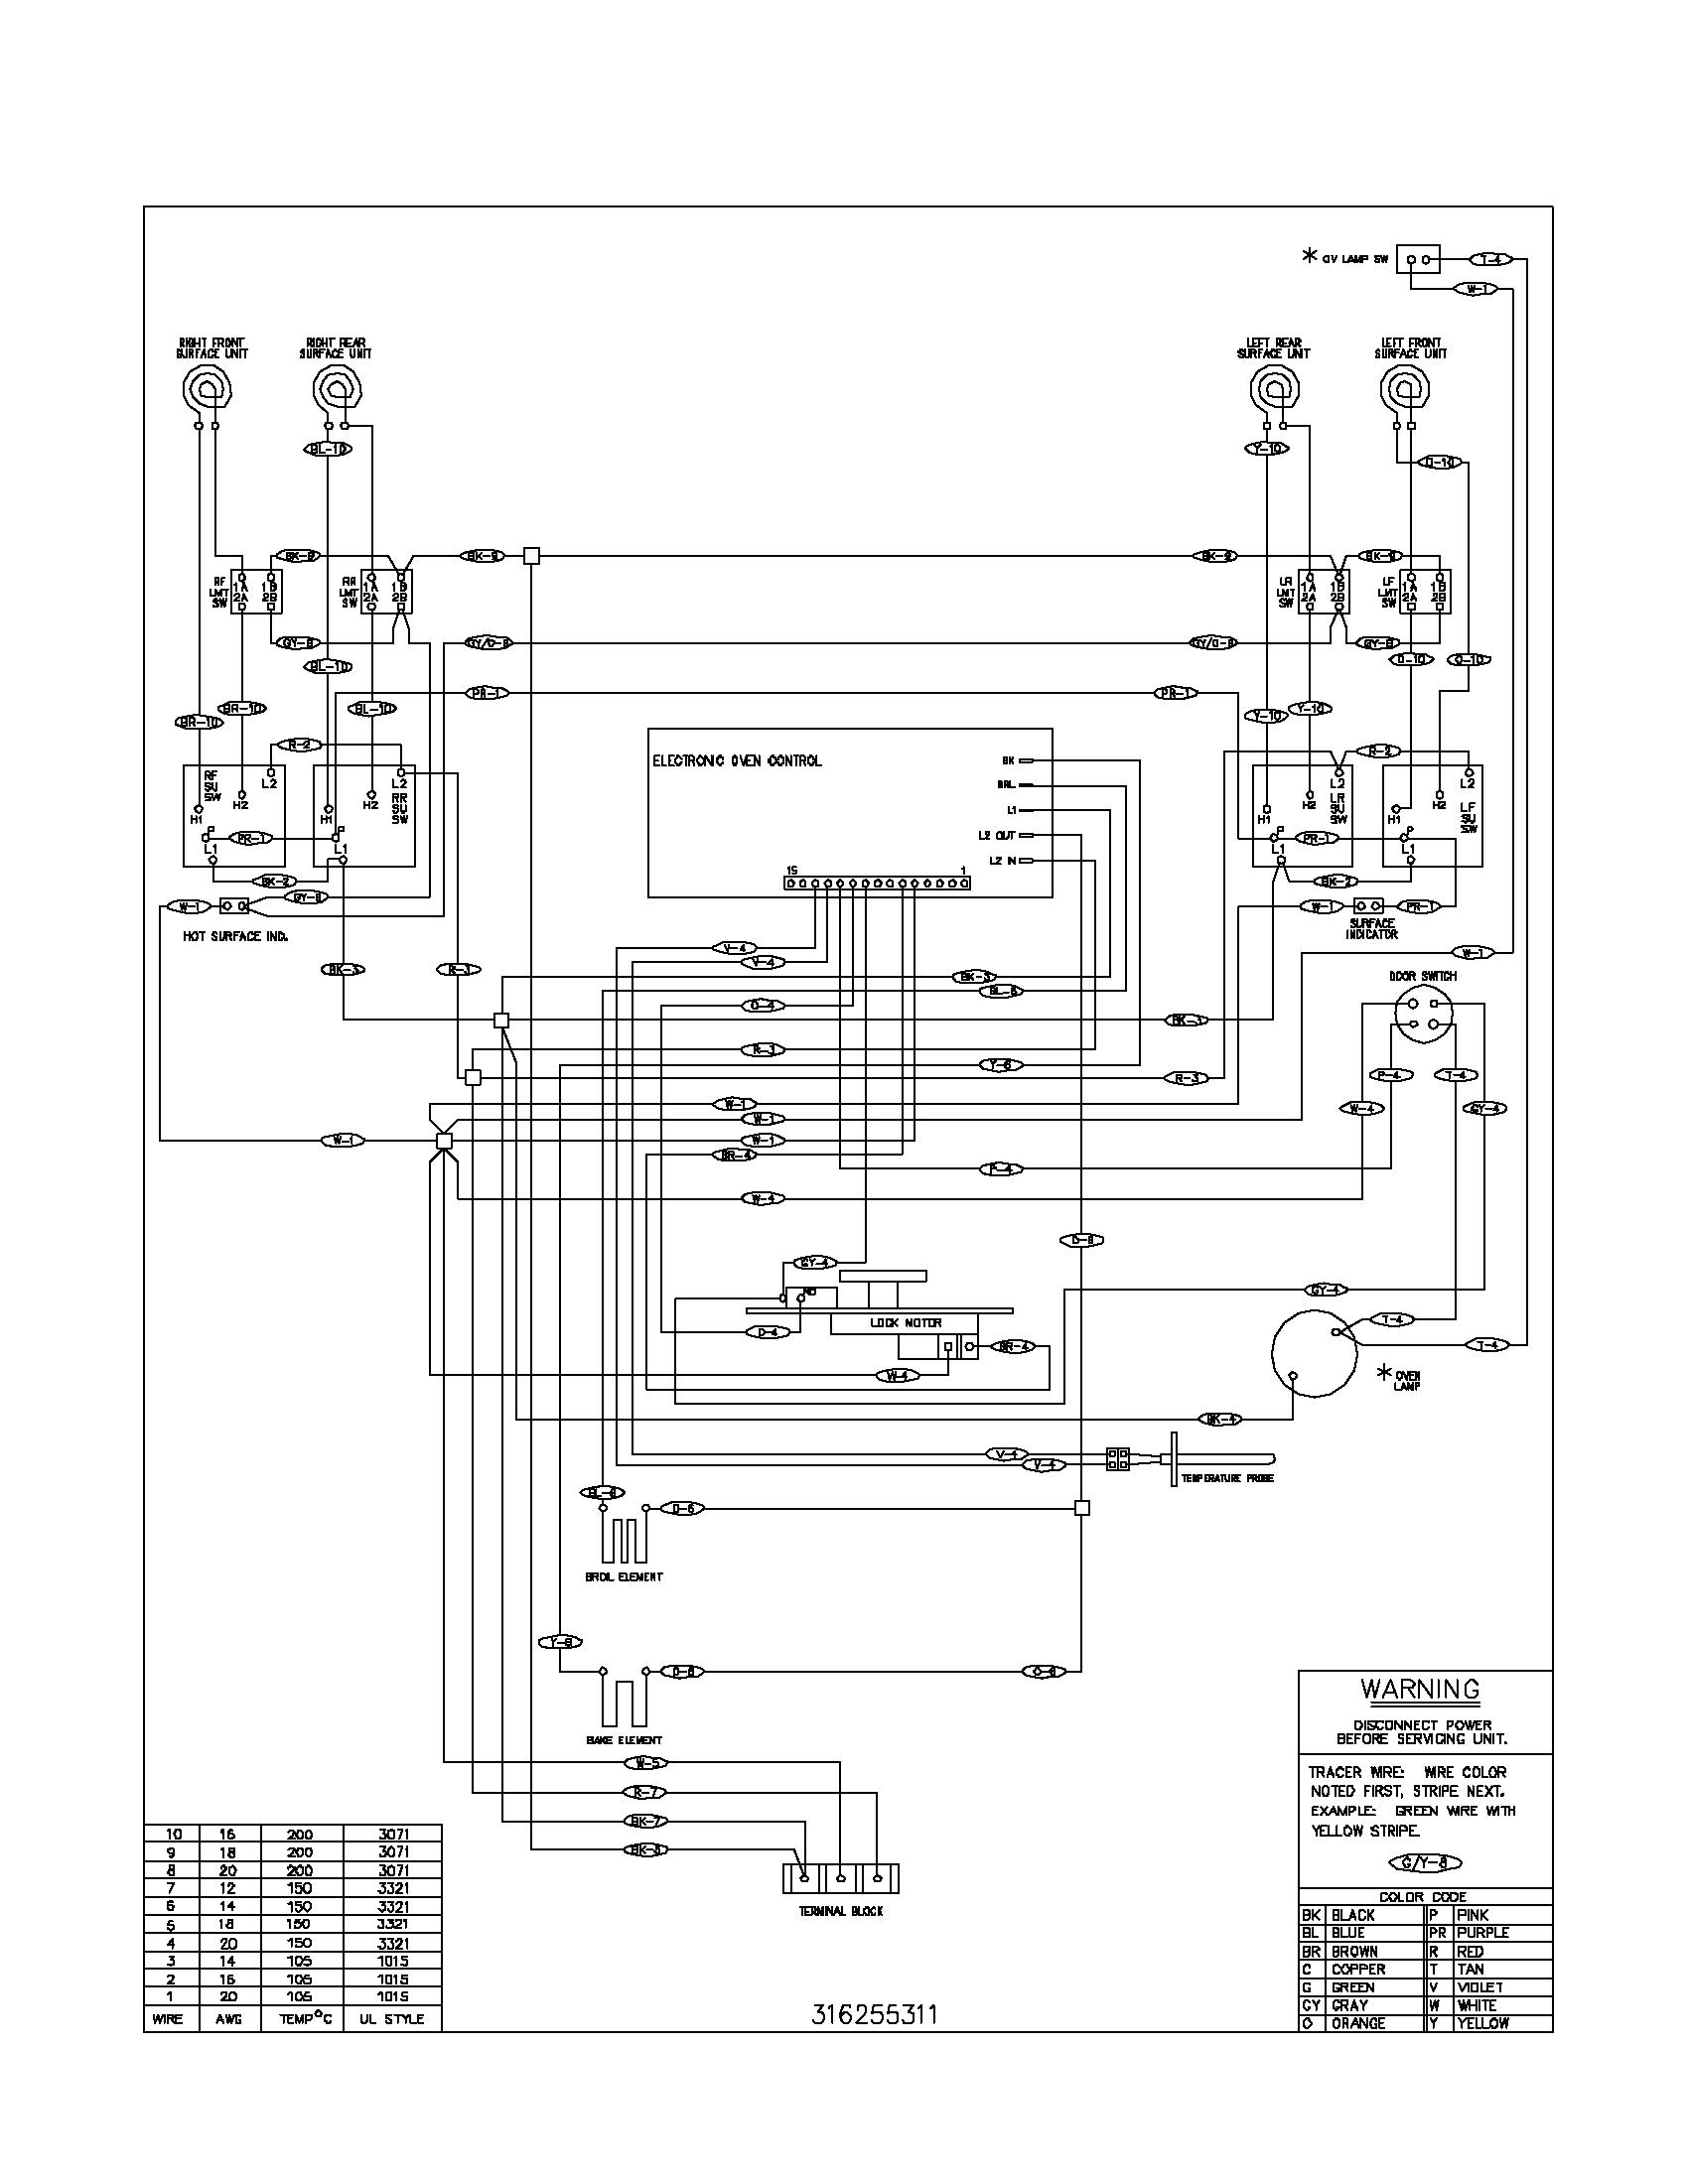 Bobcat T200 Wiring Diagram Online Schematics Fuse Box Location Diagrams T190 Parts